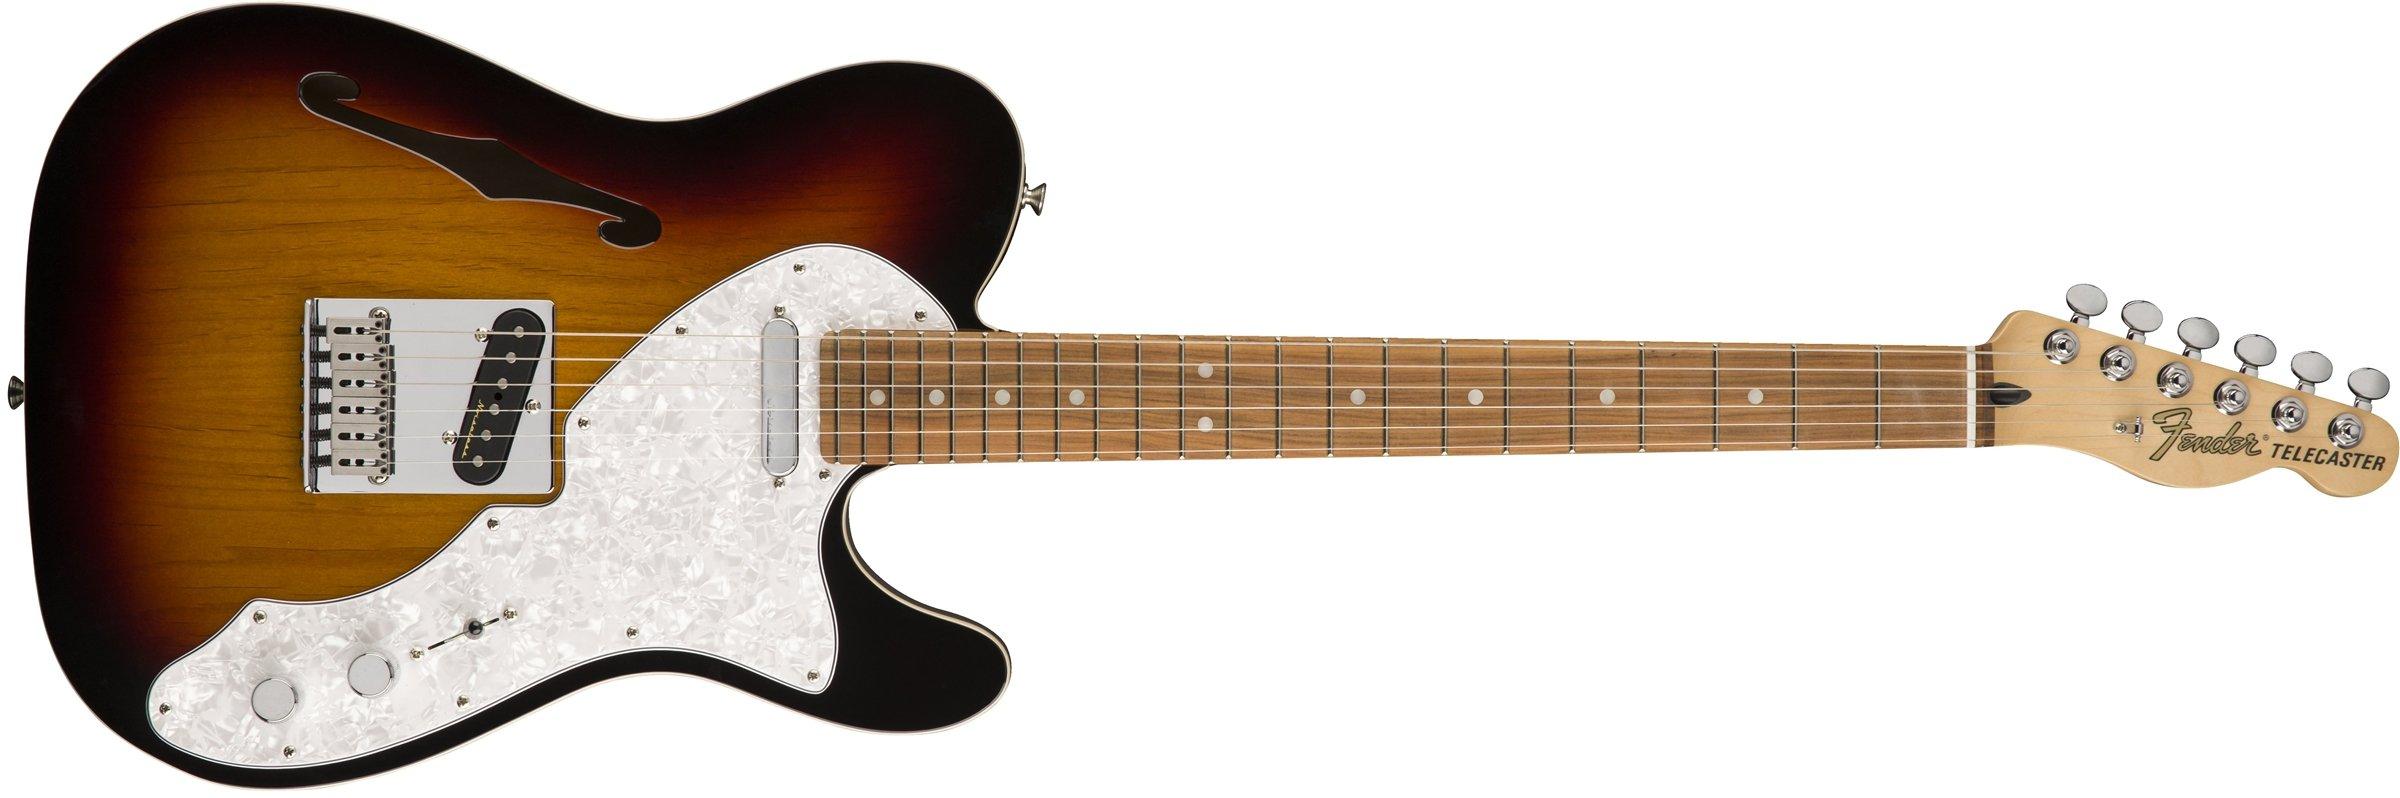 Cheap Fender Deluxe Telecaster Thinline Electric Guitar - Pau Ferro Fingerboard - 3-Color Sunburst Black Friday & Cyber Monday 2019